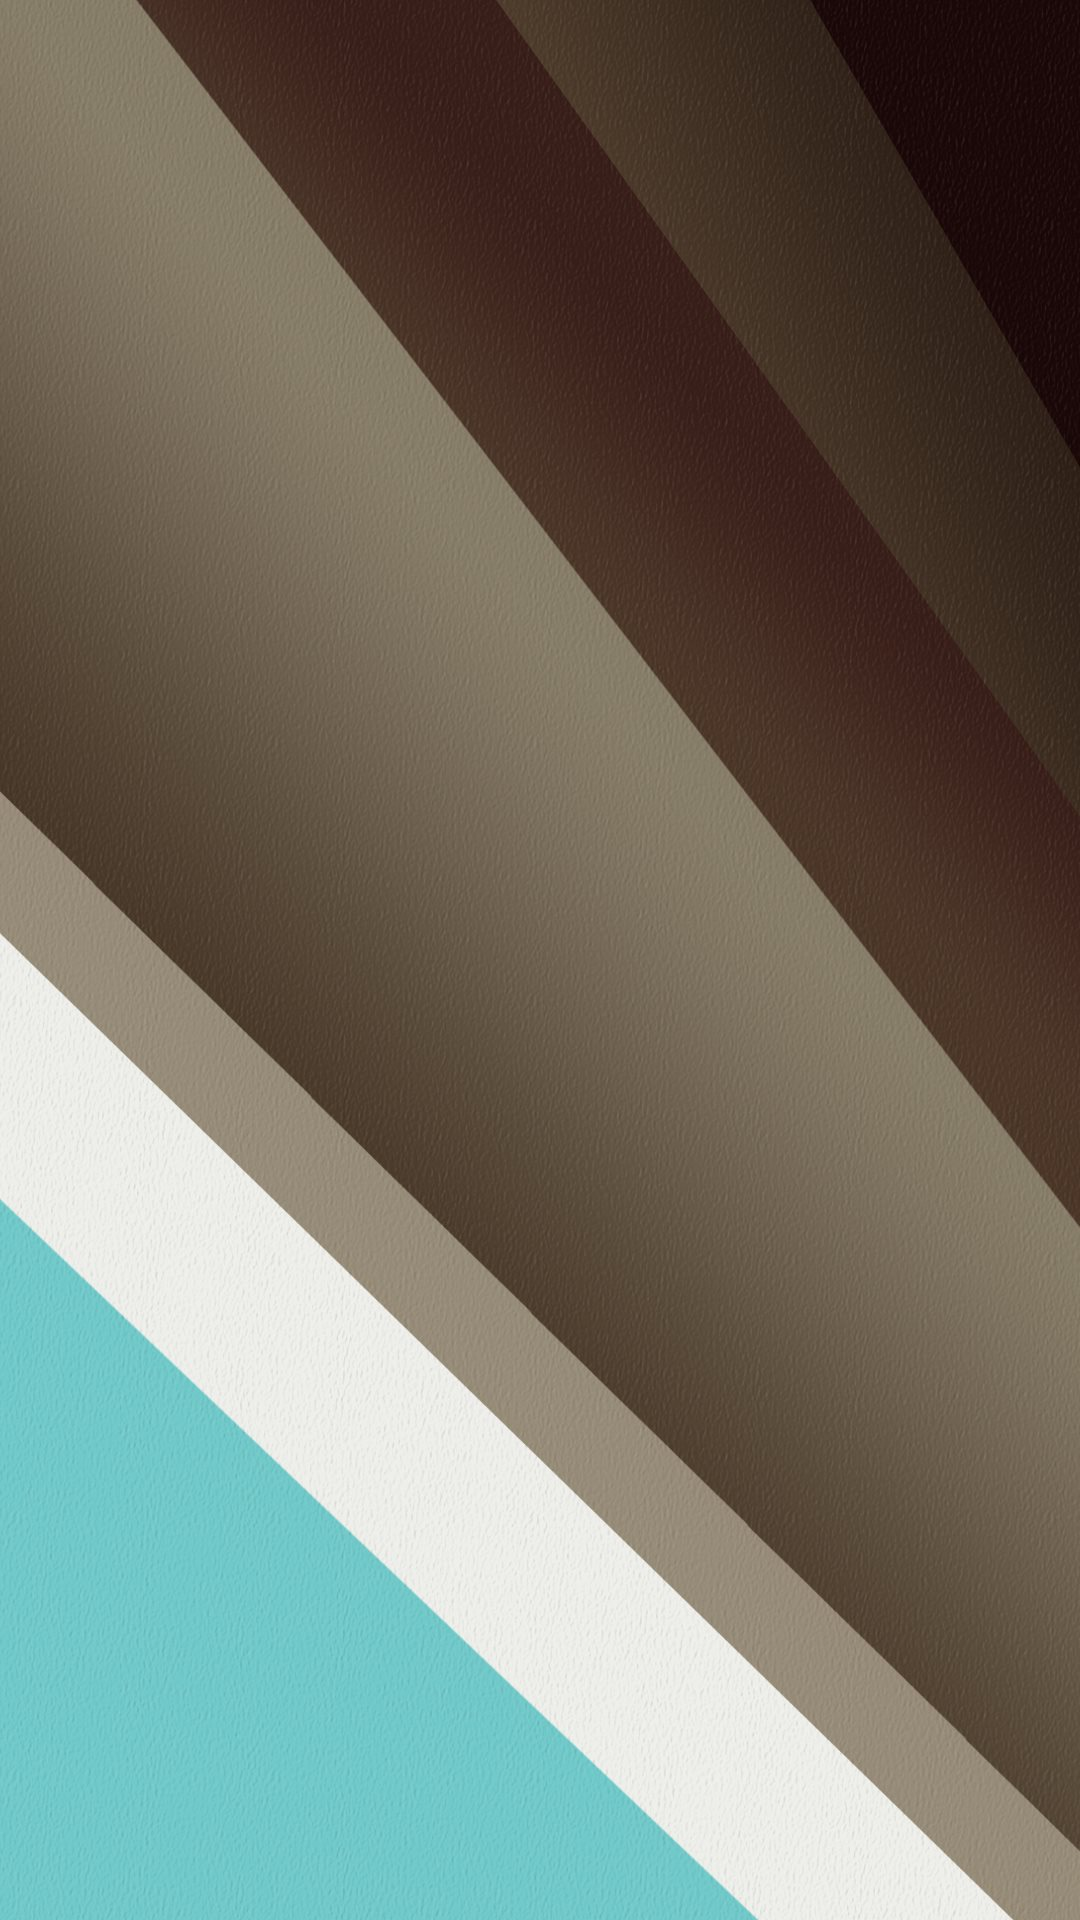 50 Android L Wallpaper On Wallpapersafari